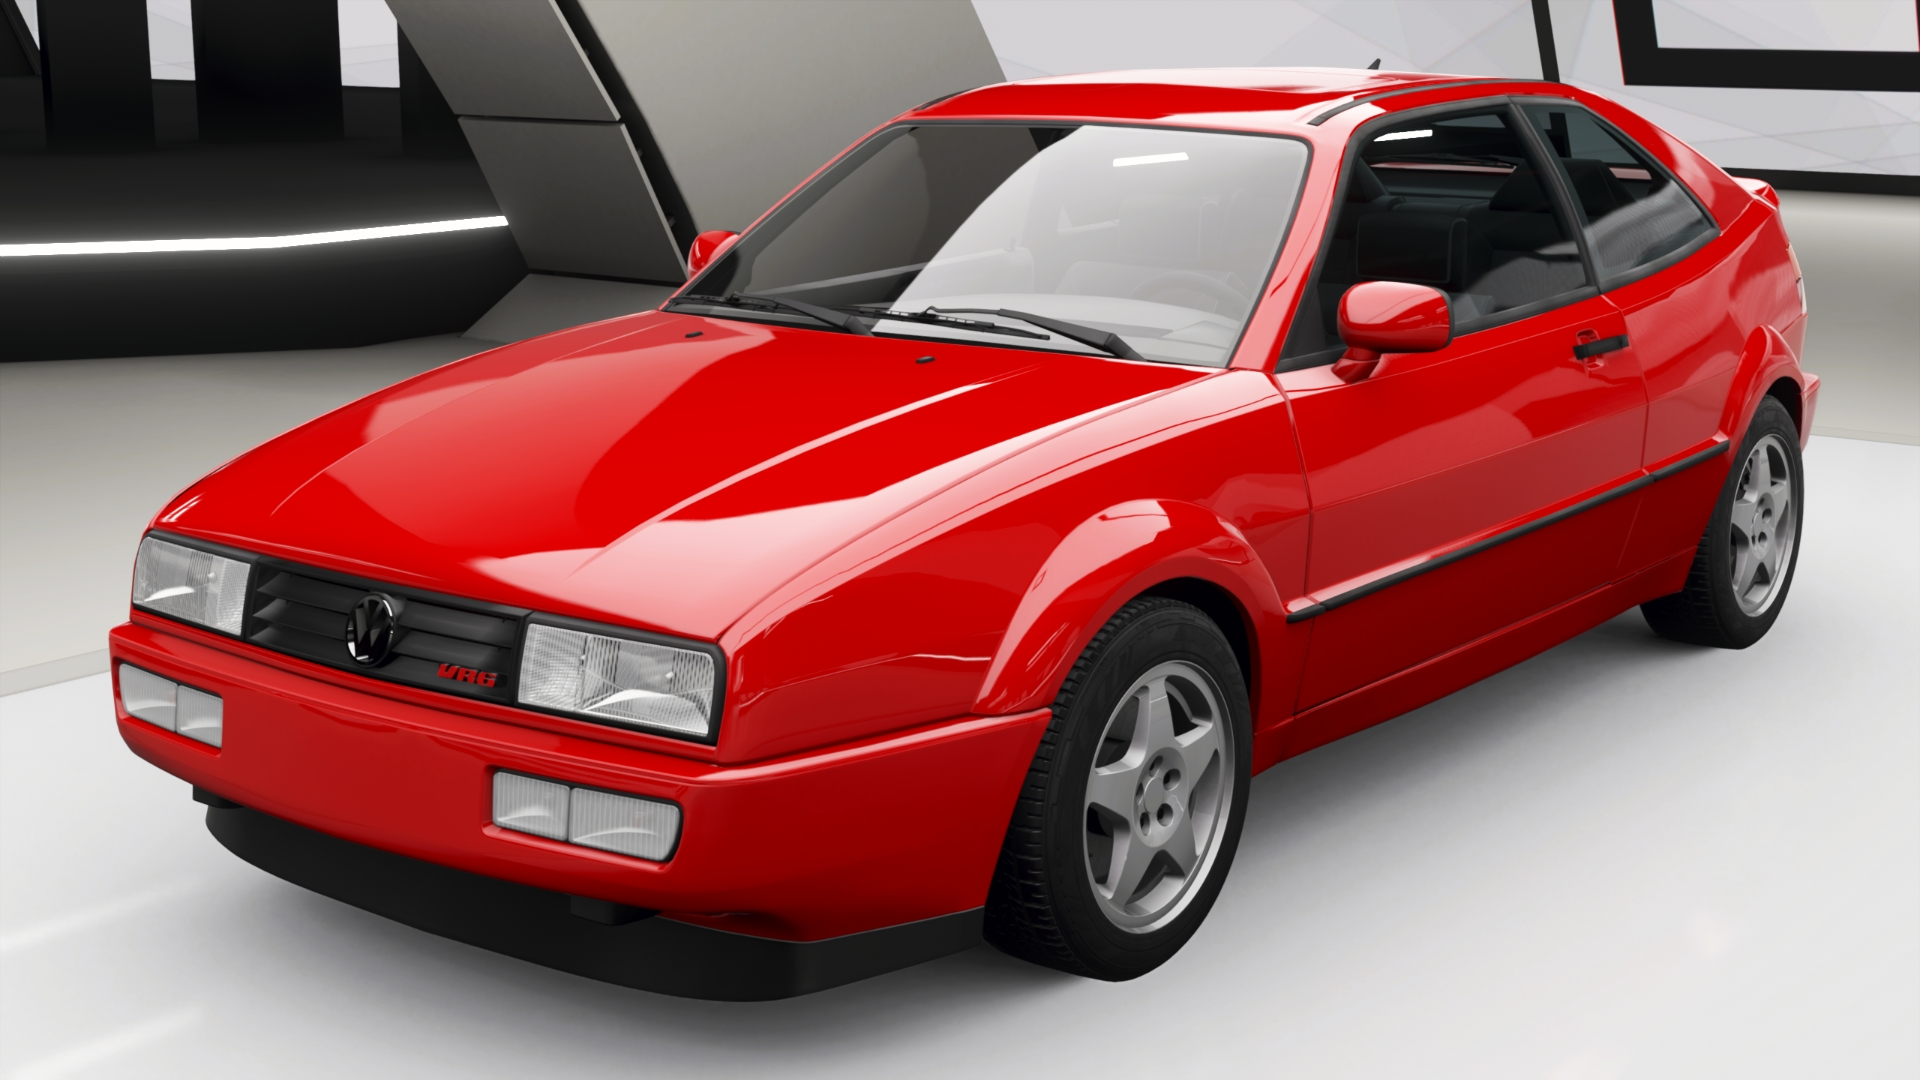 Volkswagen Corrado VR6   Forza Motorsport Wiki   FANDOM